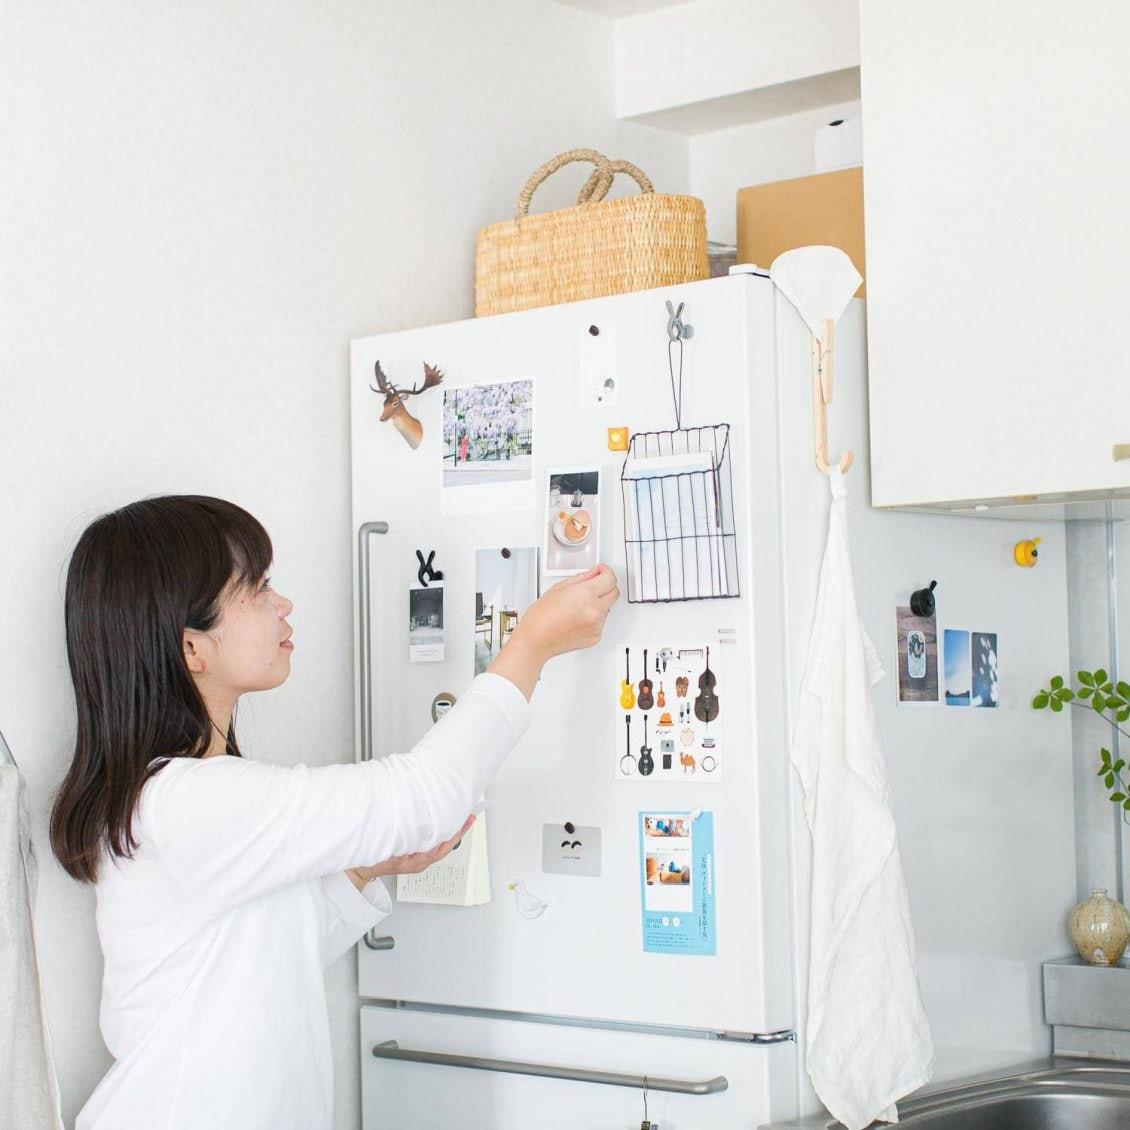 【BRAND NOTE】冷蔵庫からベッドルームまで。スタッフ宅で見つけた、自分の「好き」の残しかた